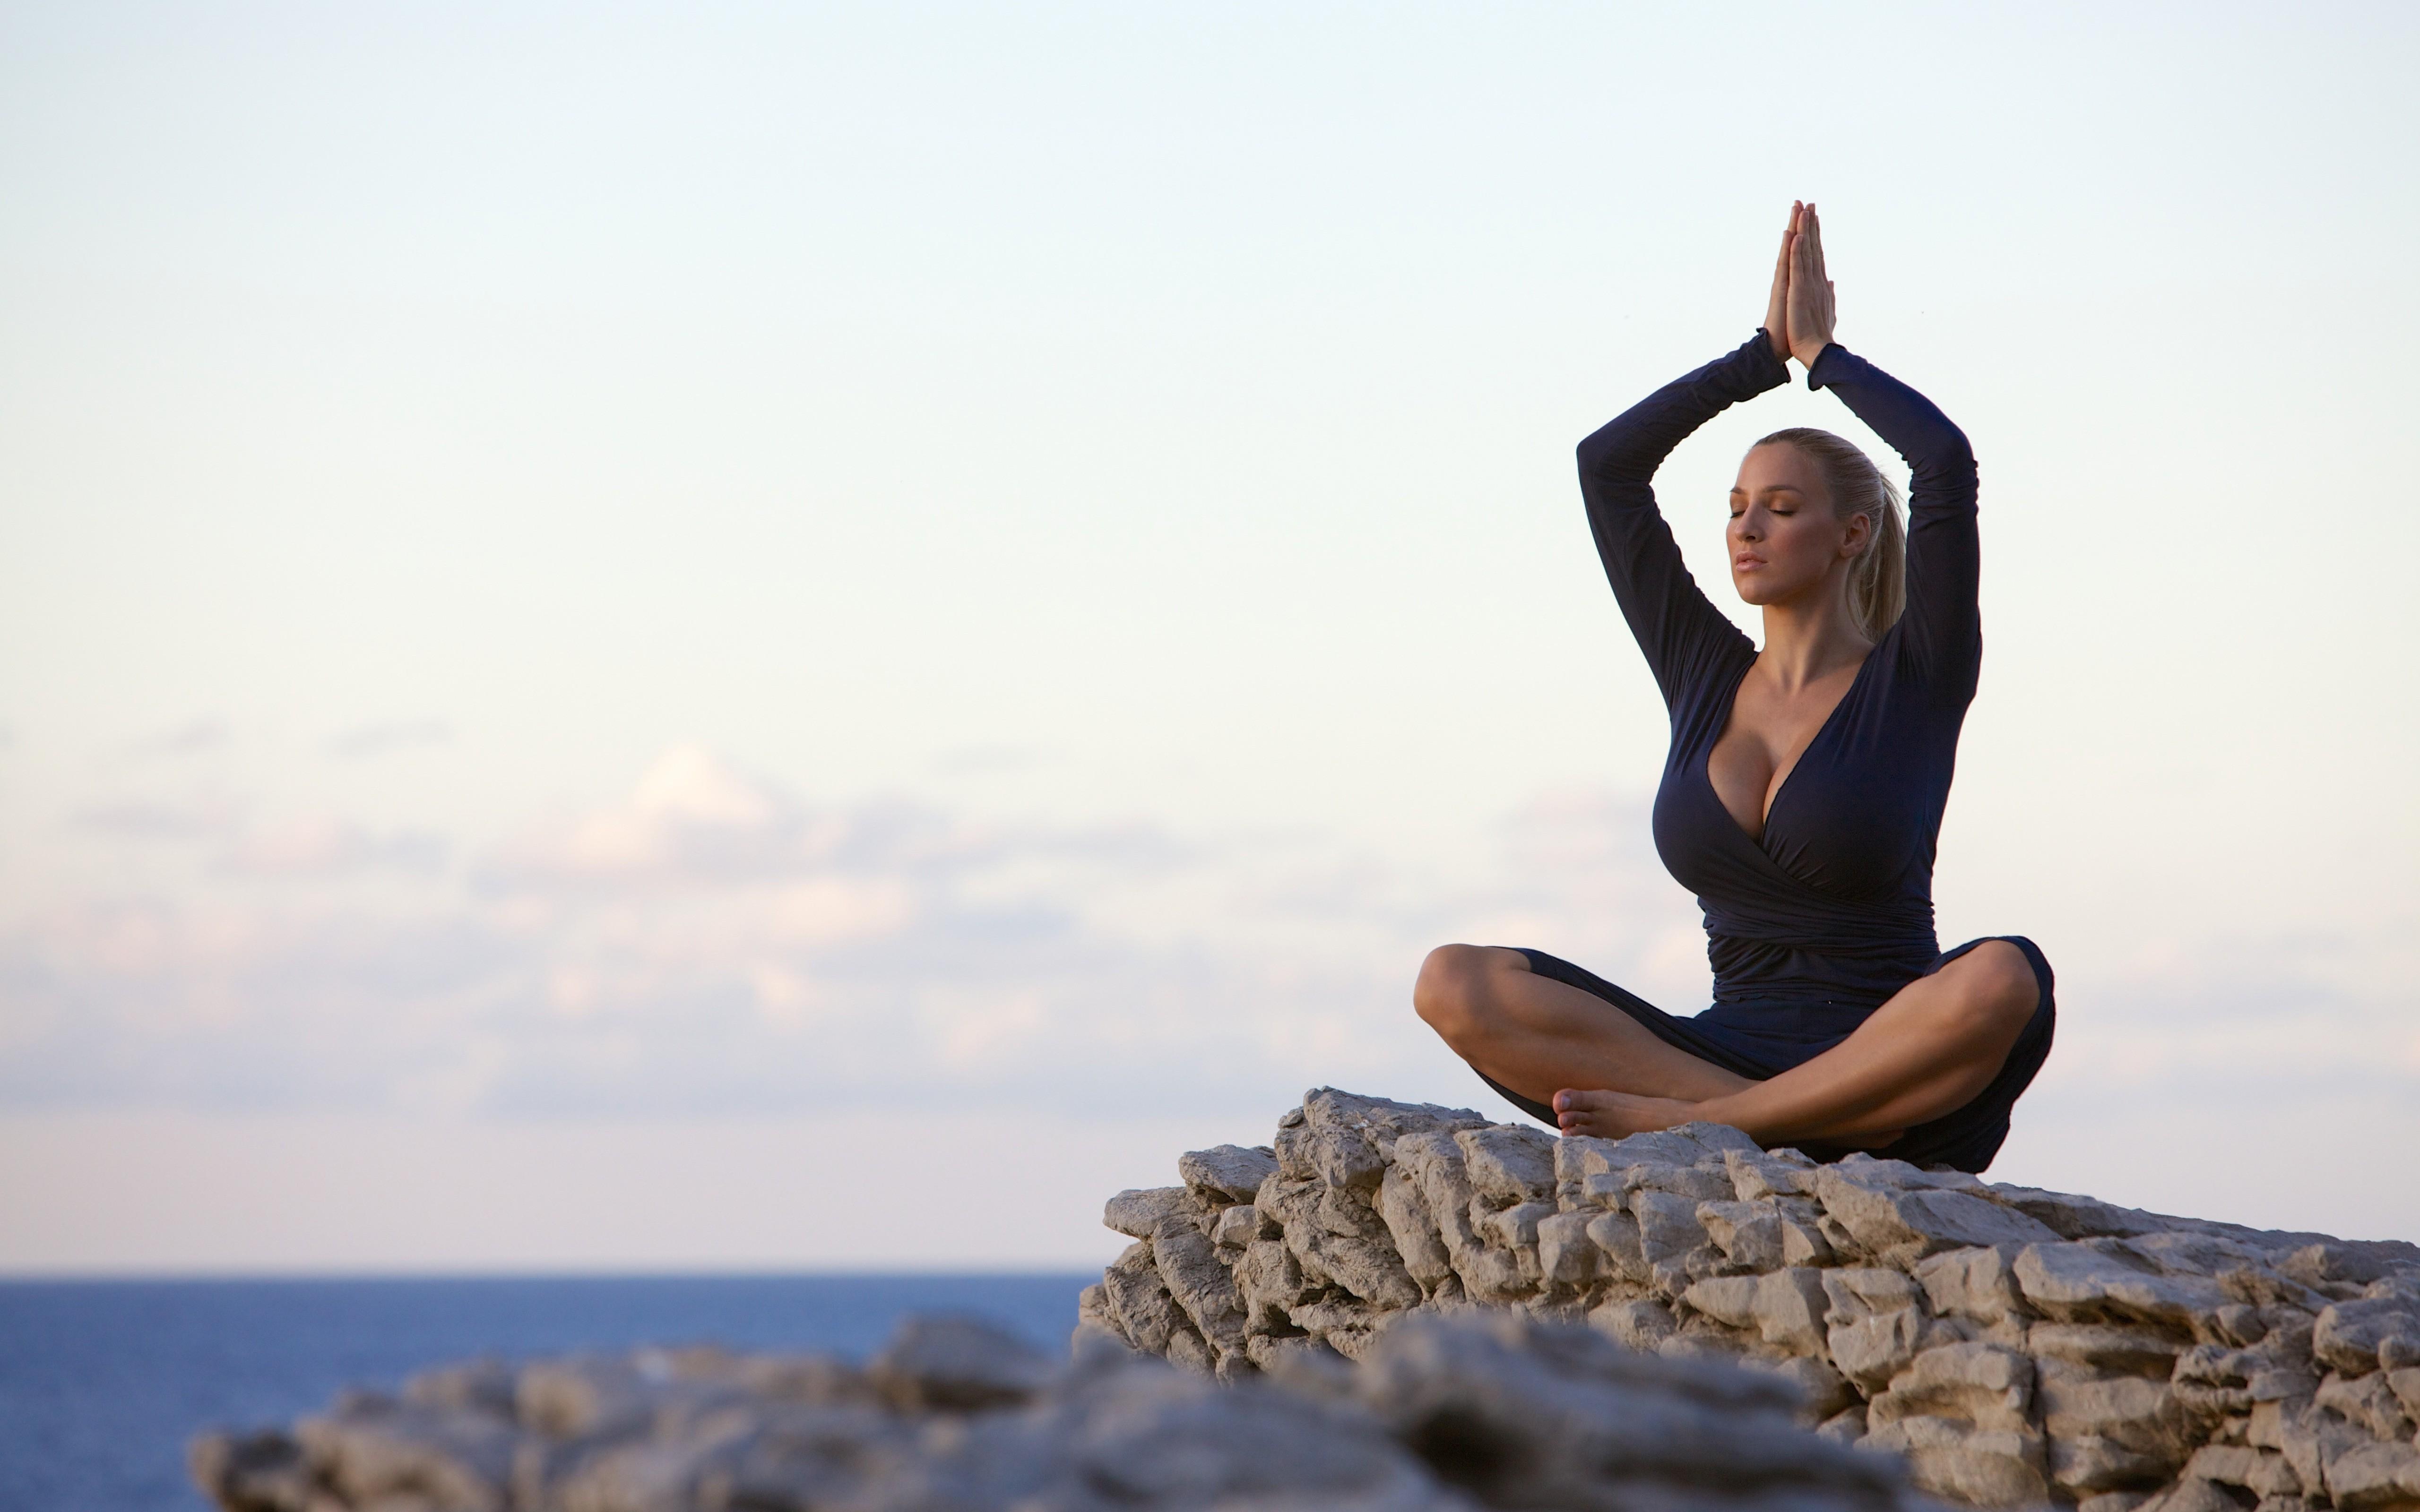 Wallpaper : women, Jordan Carver, big boobs, yoga